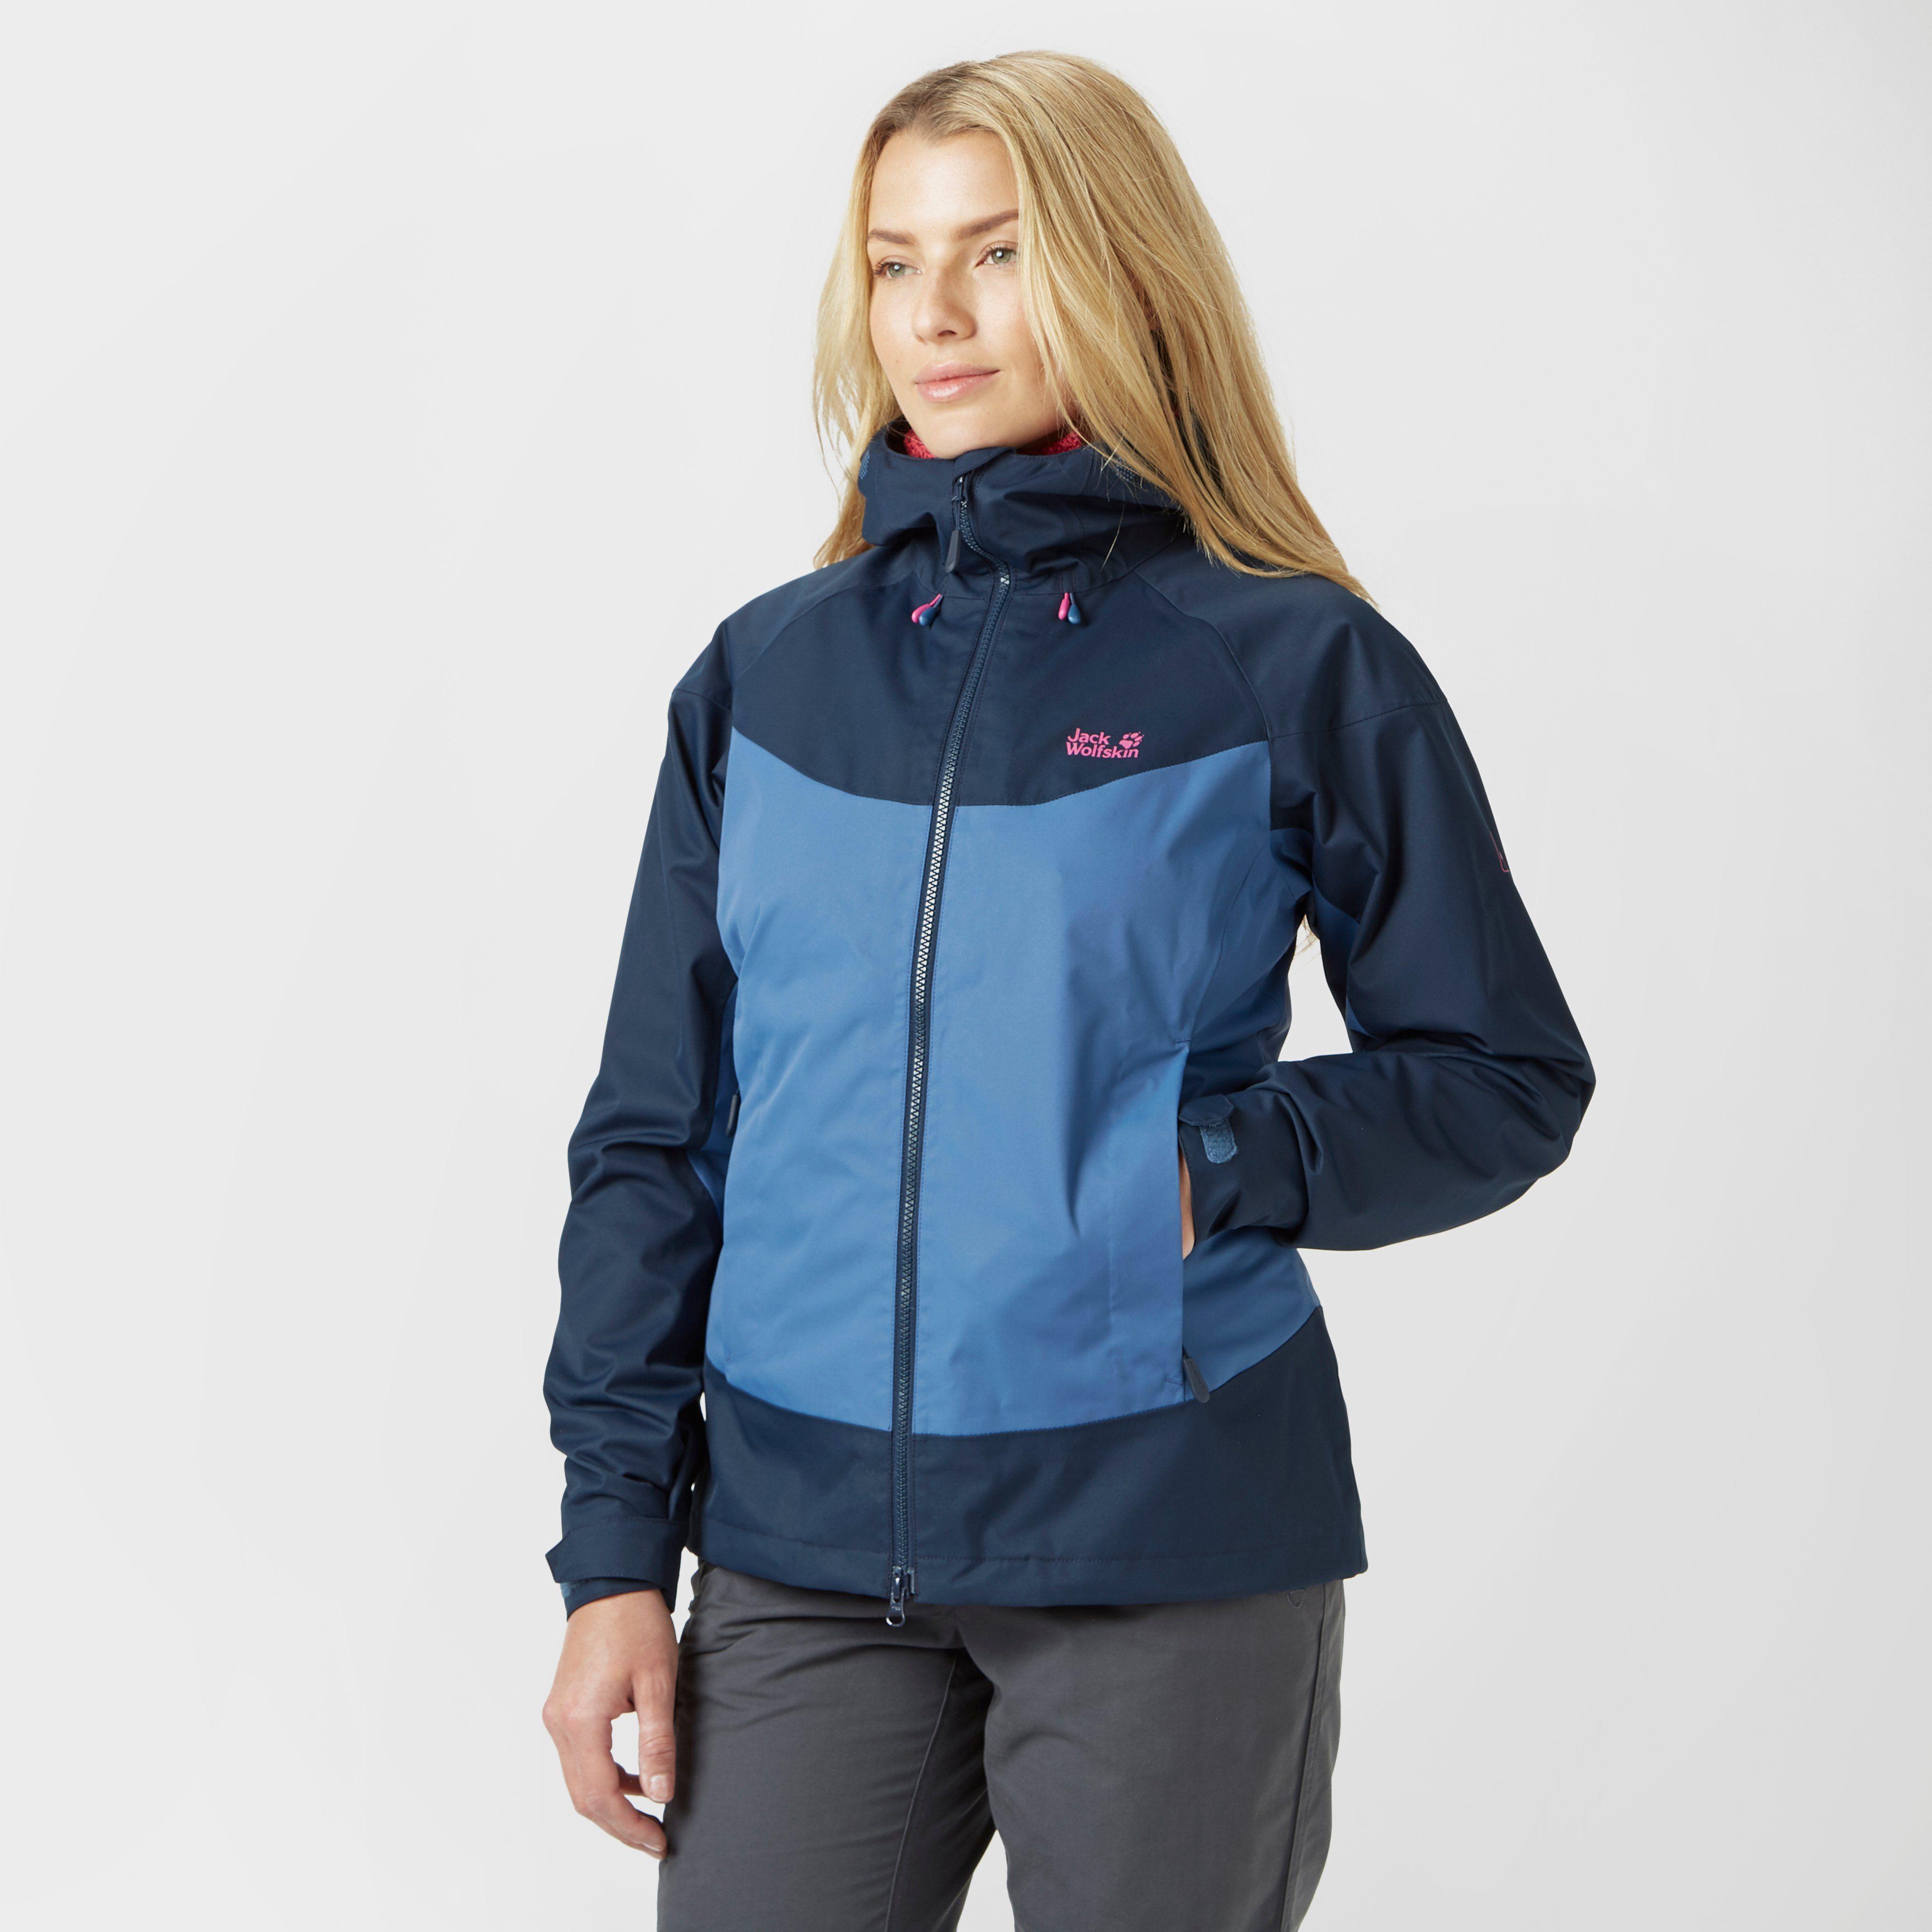 JACK WOLFSKIN Women's Northern Summit Waterproof Jacket